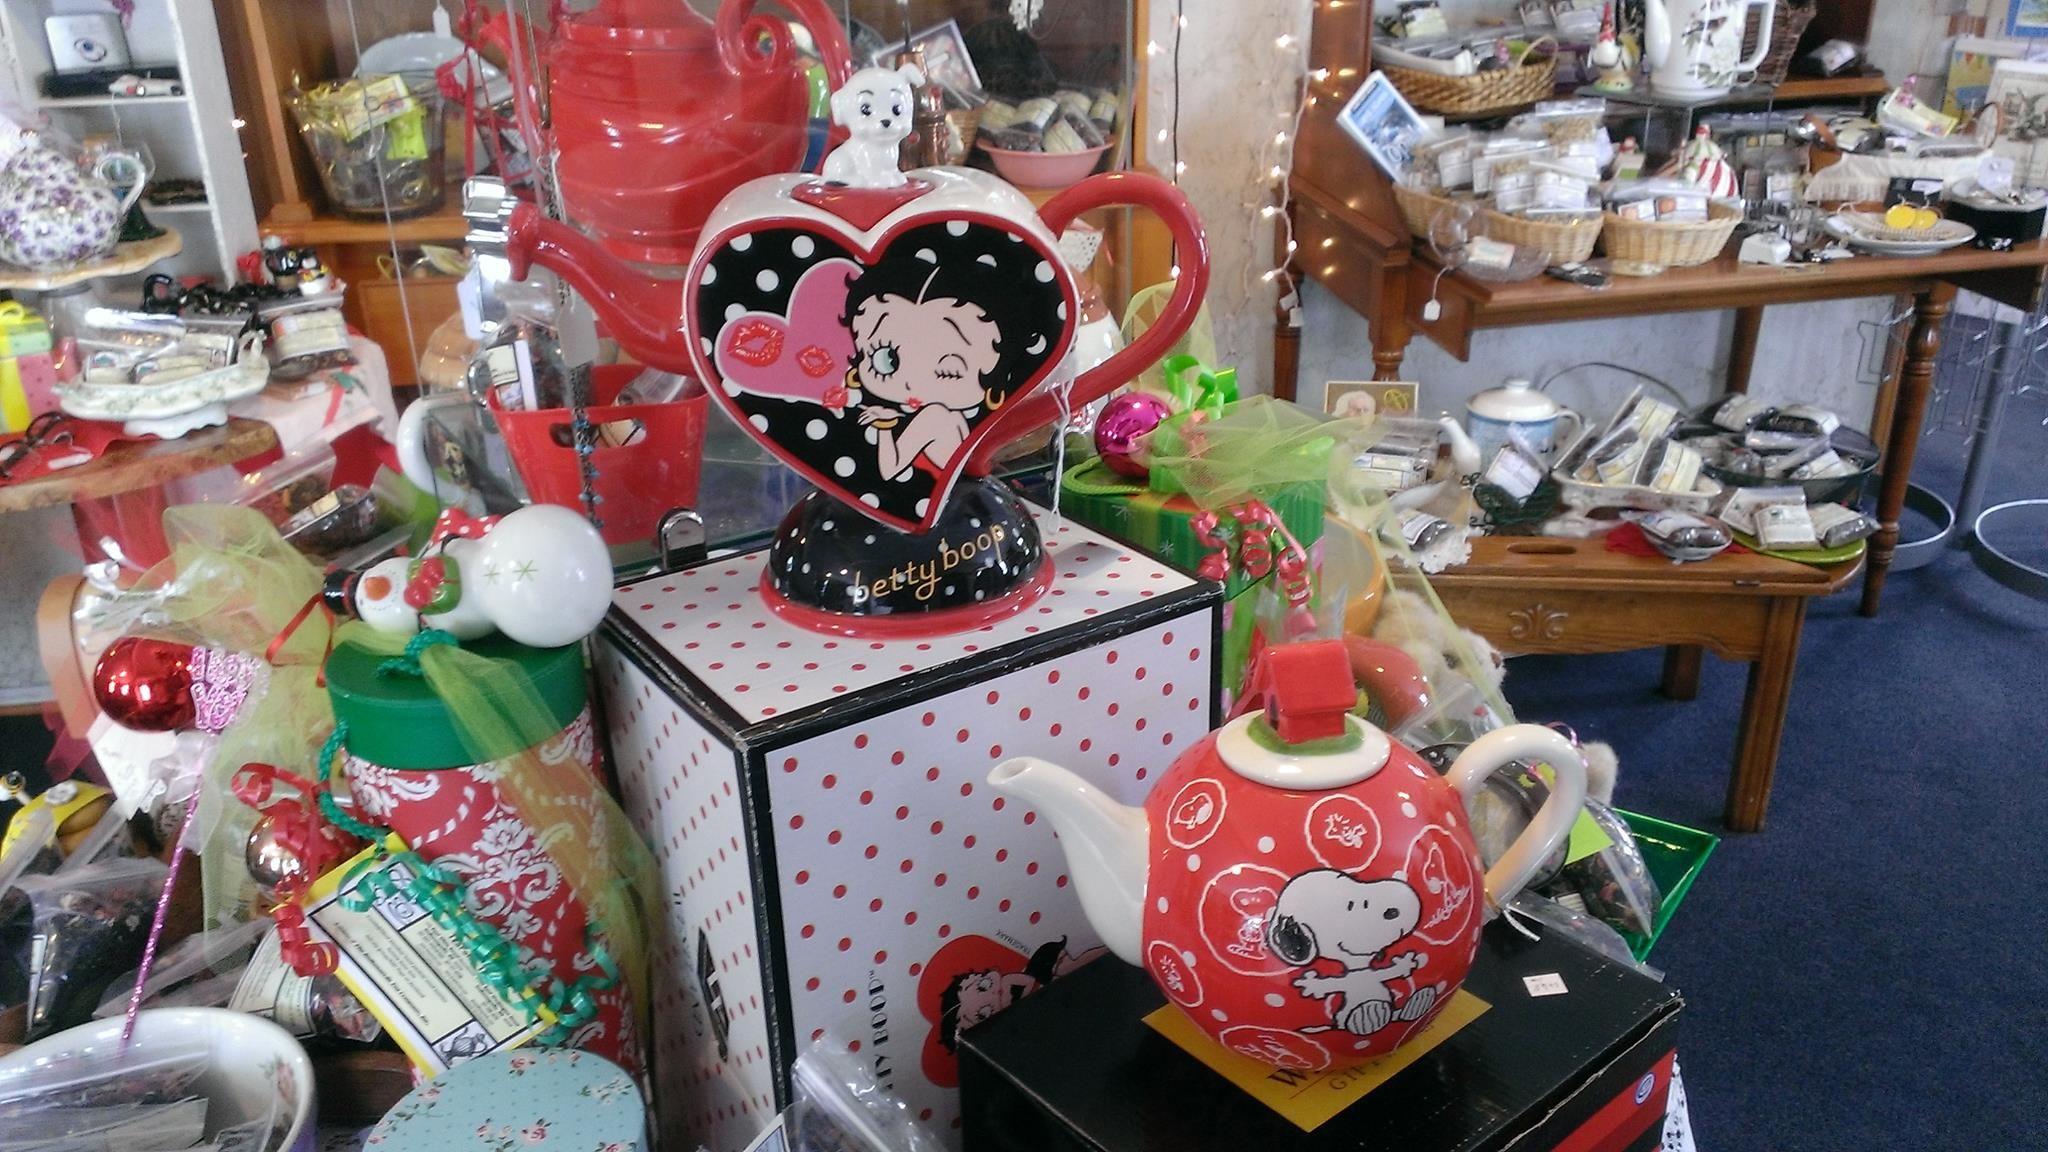 Betty Boop!!! TeaPots!!! dots all over.... TeaPots n Treasures 133 East Ohio Street and 11500 East Washington Street   317 687 8768 and 317 500 1079   www.teapots4u.com